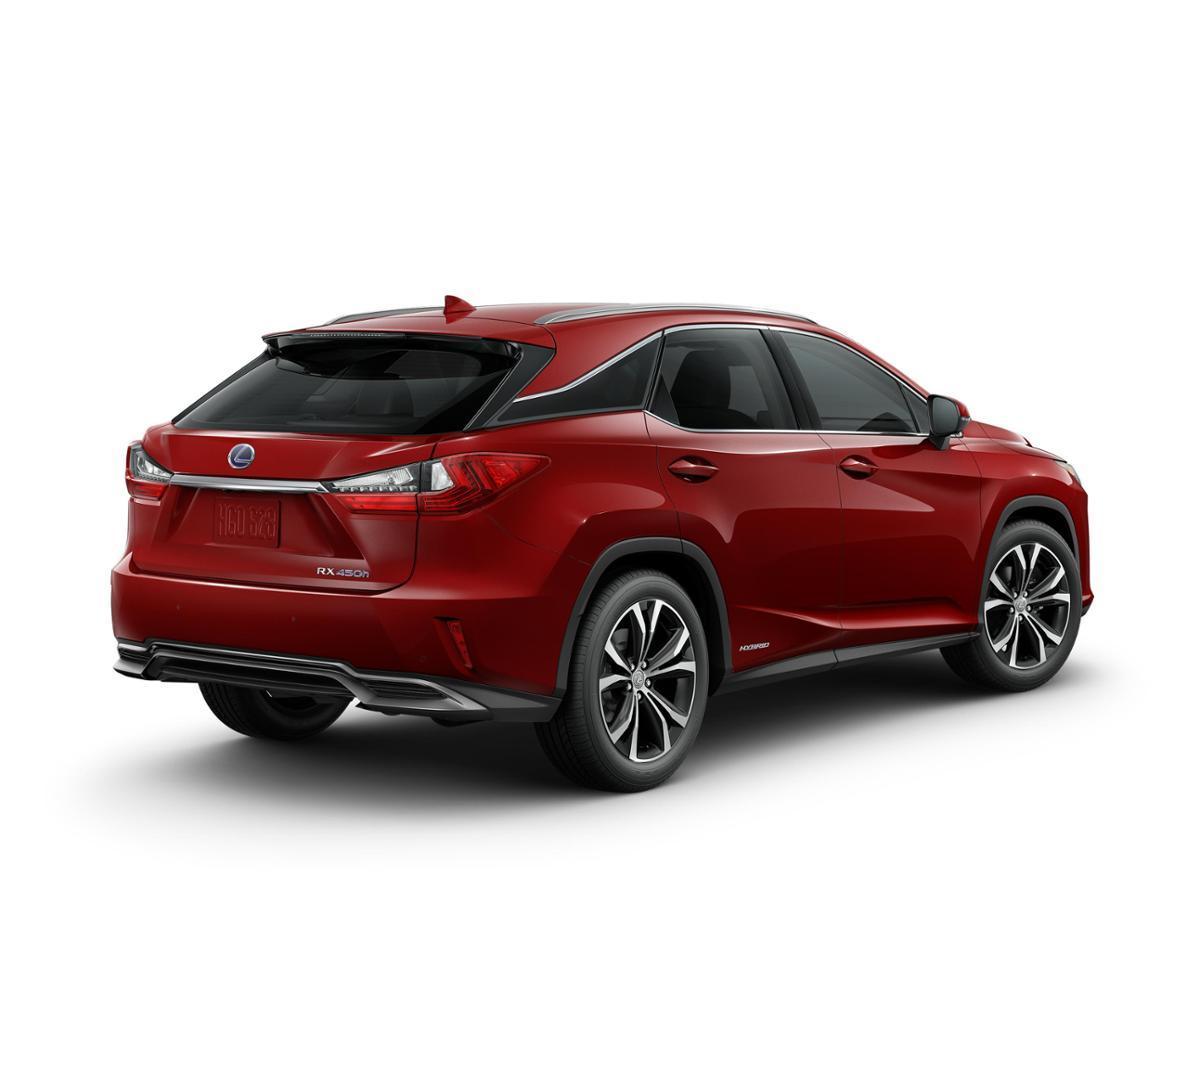 2019 Lexus Rx Hybrid: 2019 Lexus RX 450h For Sale In Edison